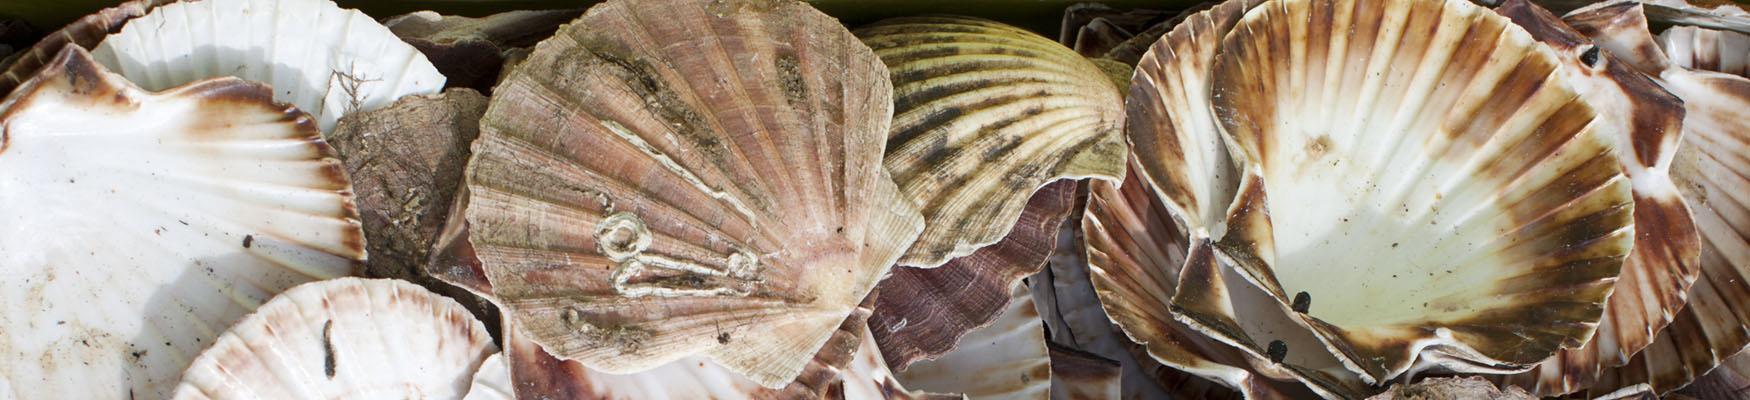 Empty scallop shells